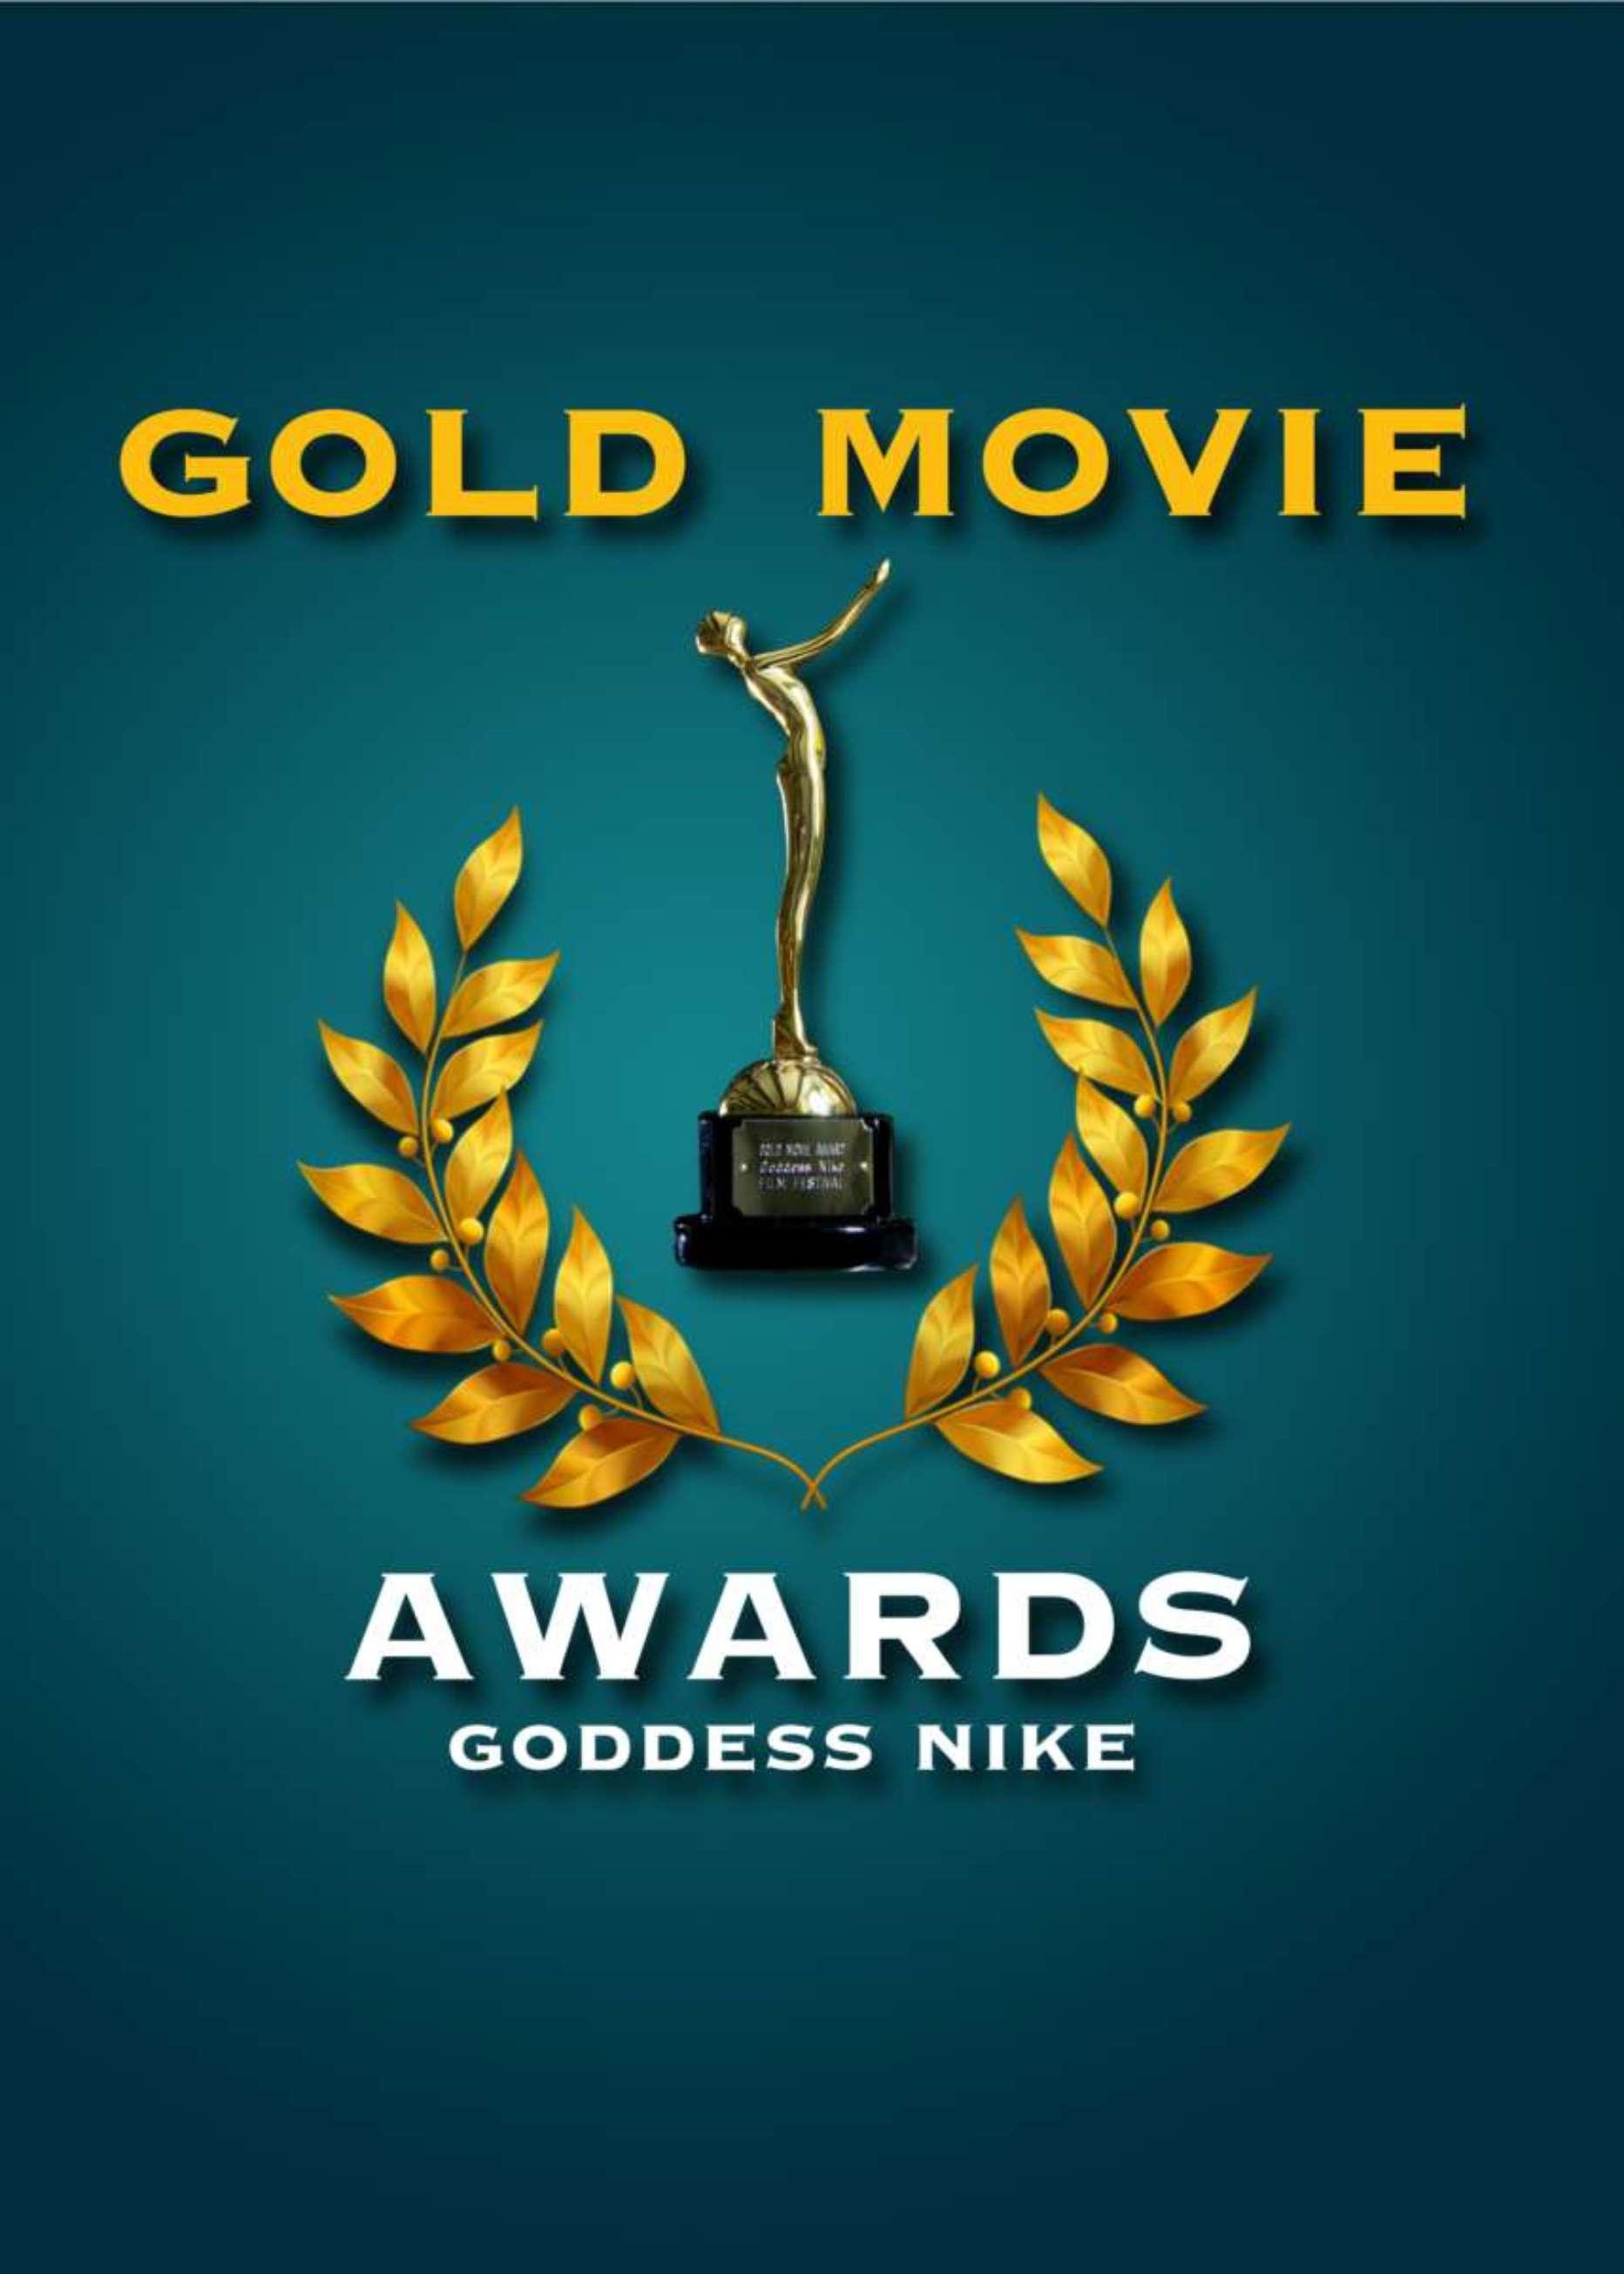 GOLD MOVIE AWARDS